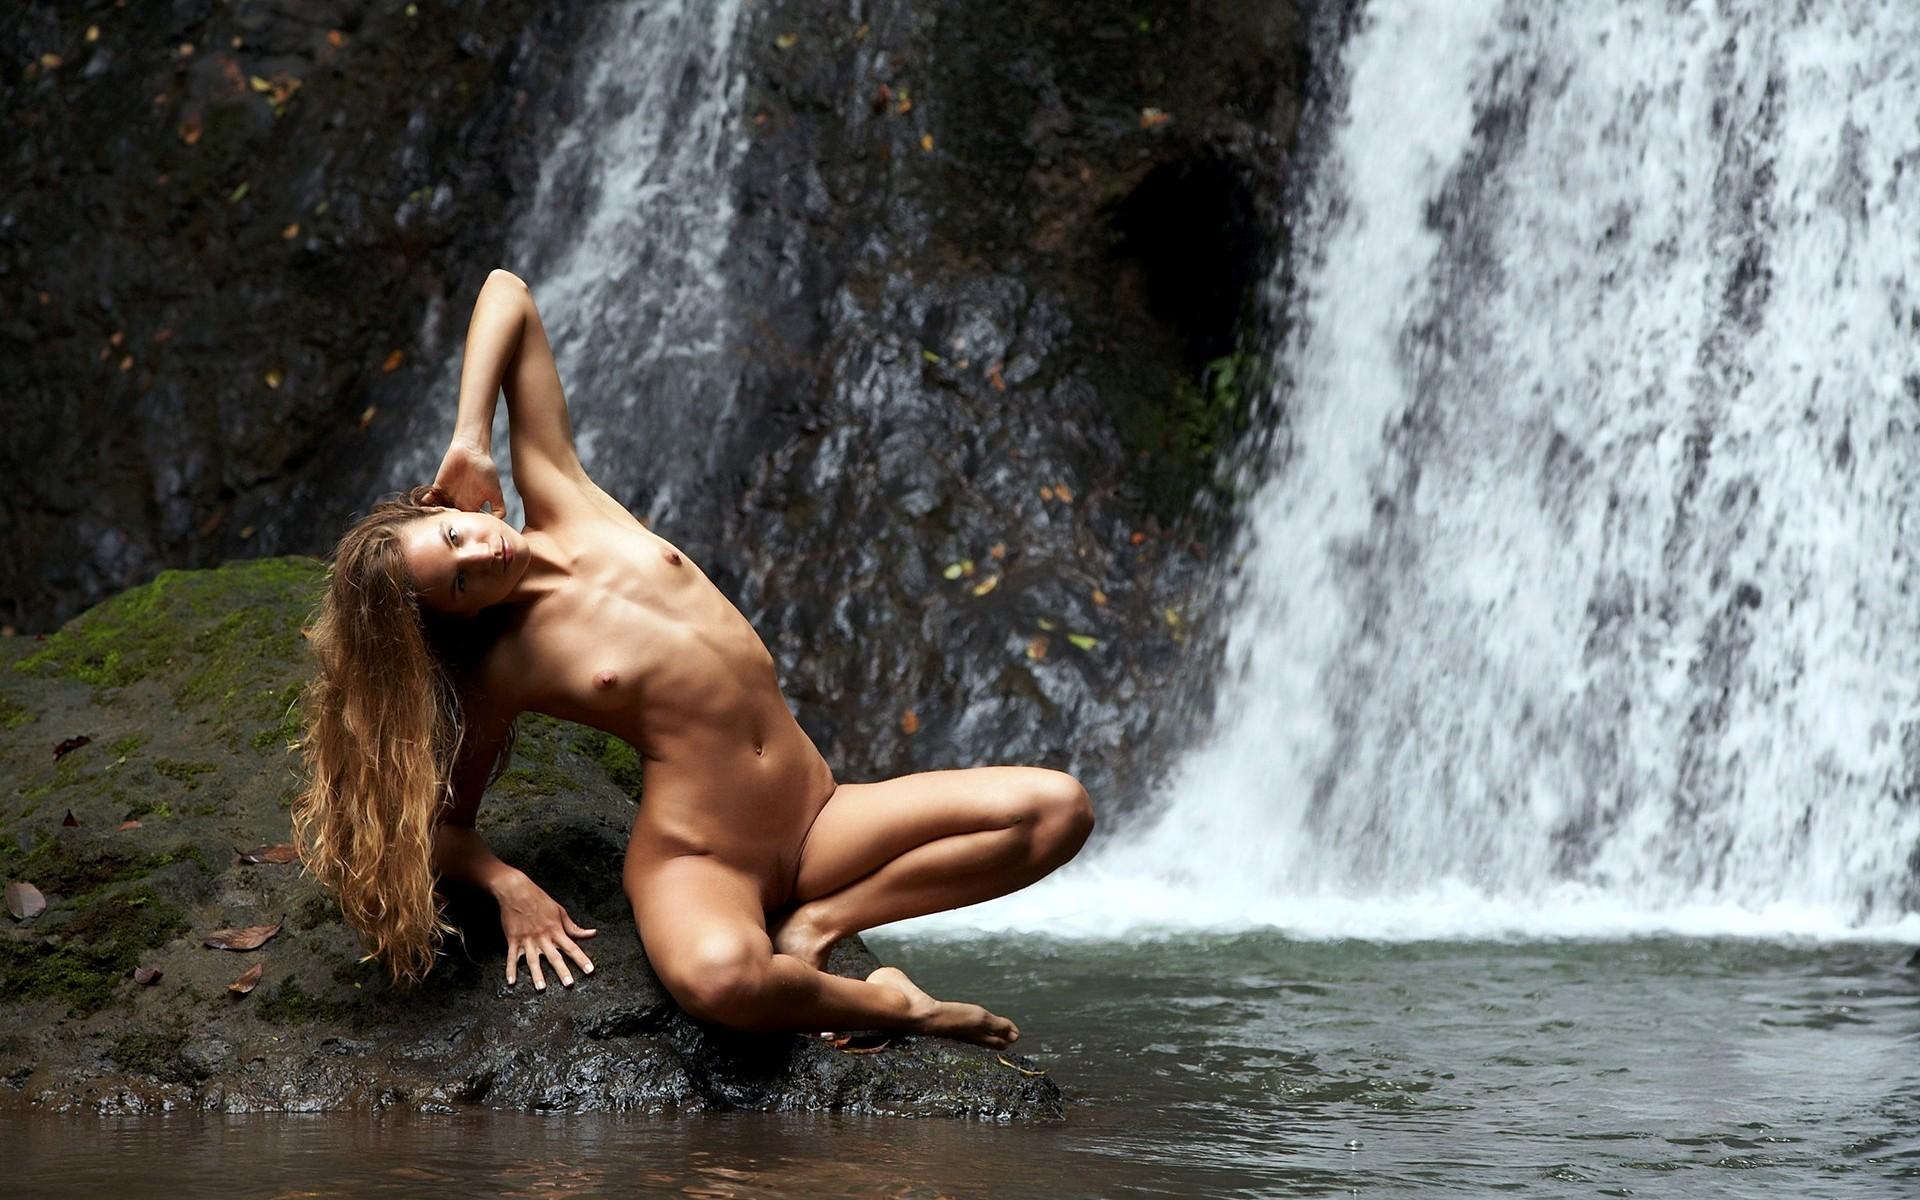 waterfall-sex-girl-free-teen-mature-sex-movies